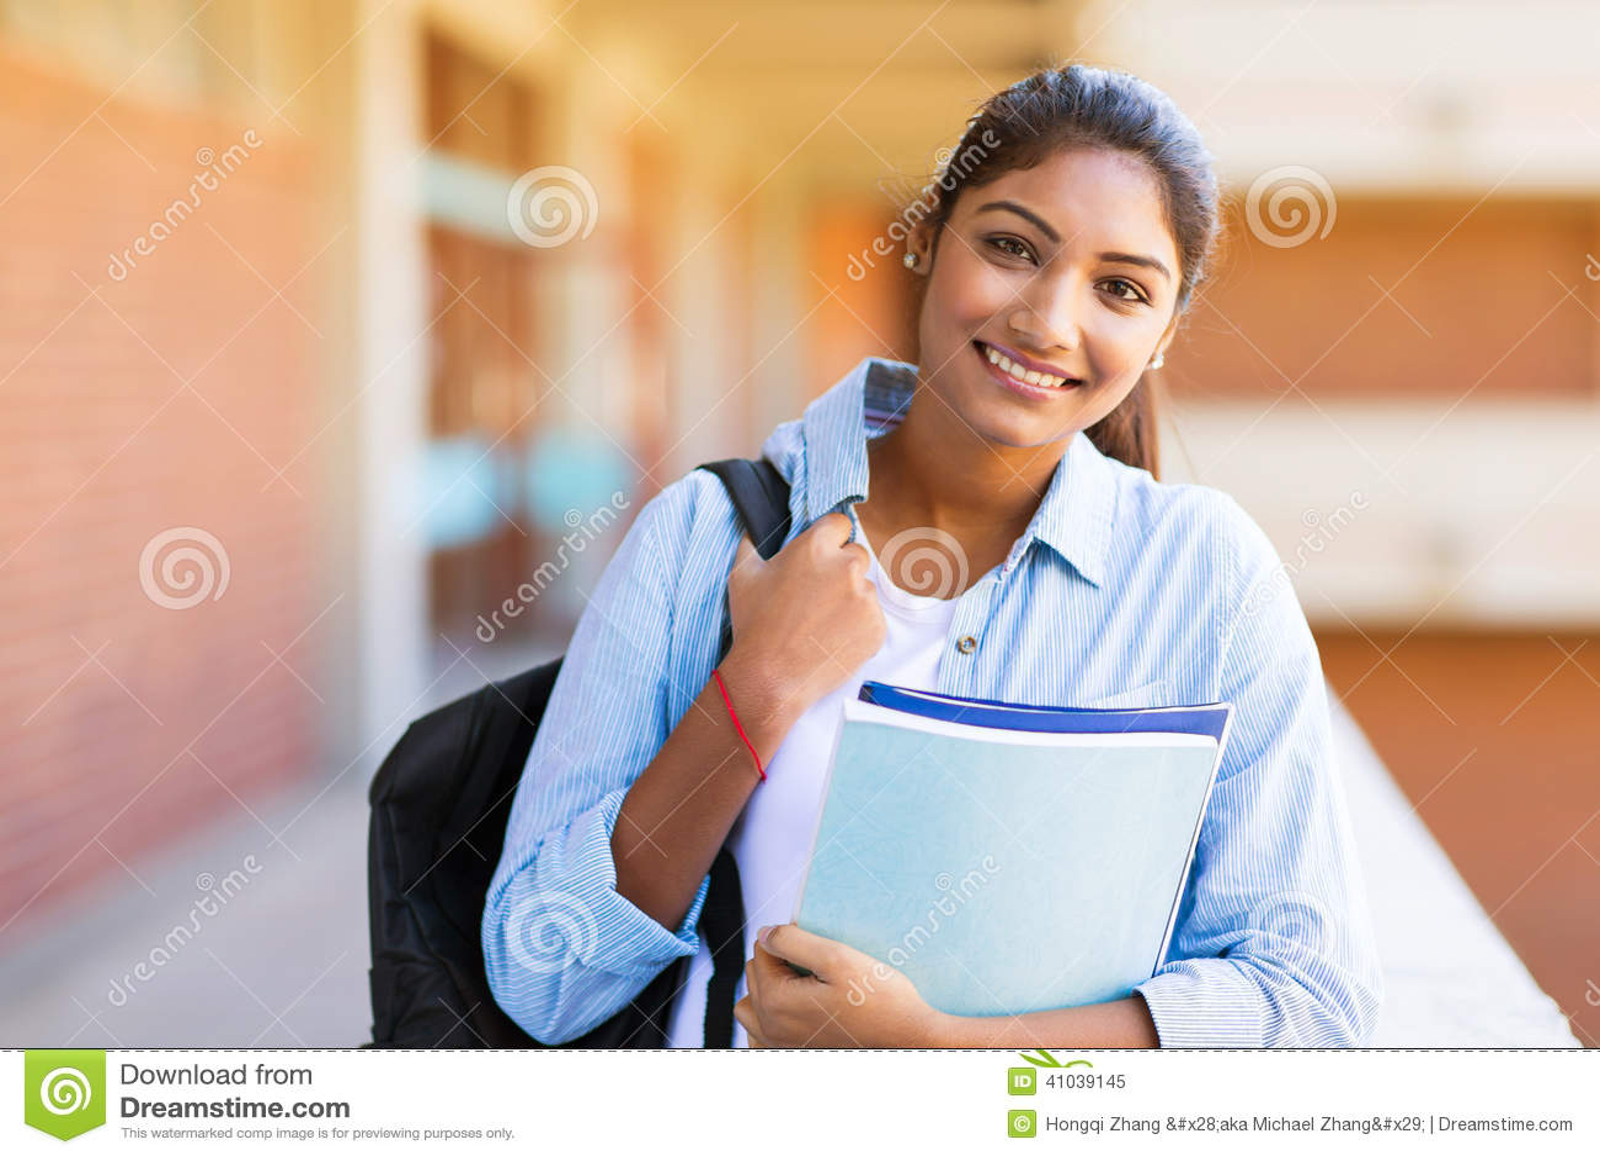 Estudiante universitario de sexo femenino